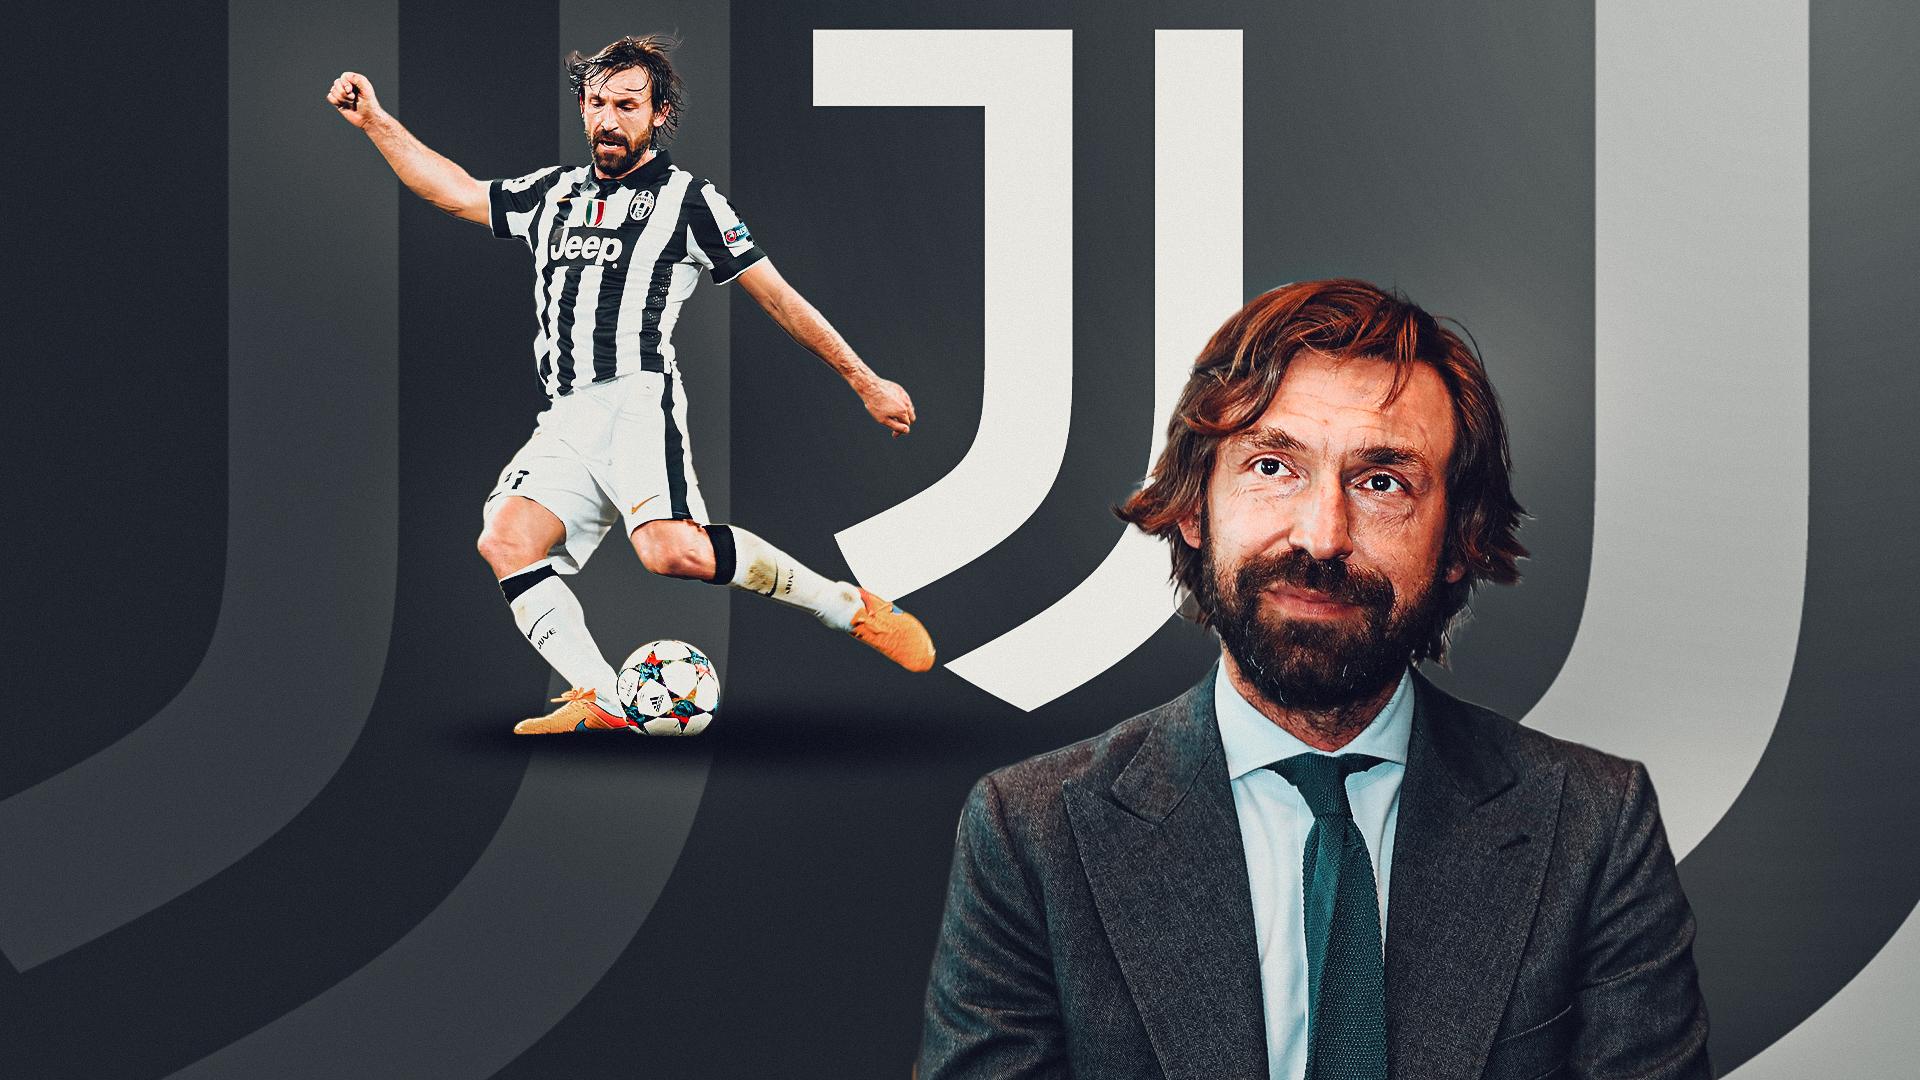 Juventus name Pirlo new head coach hours after sacking Sarri